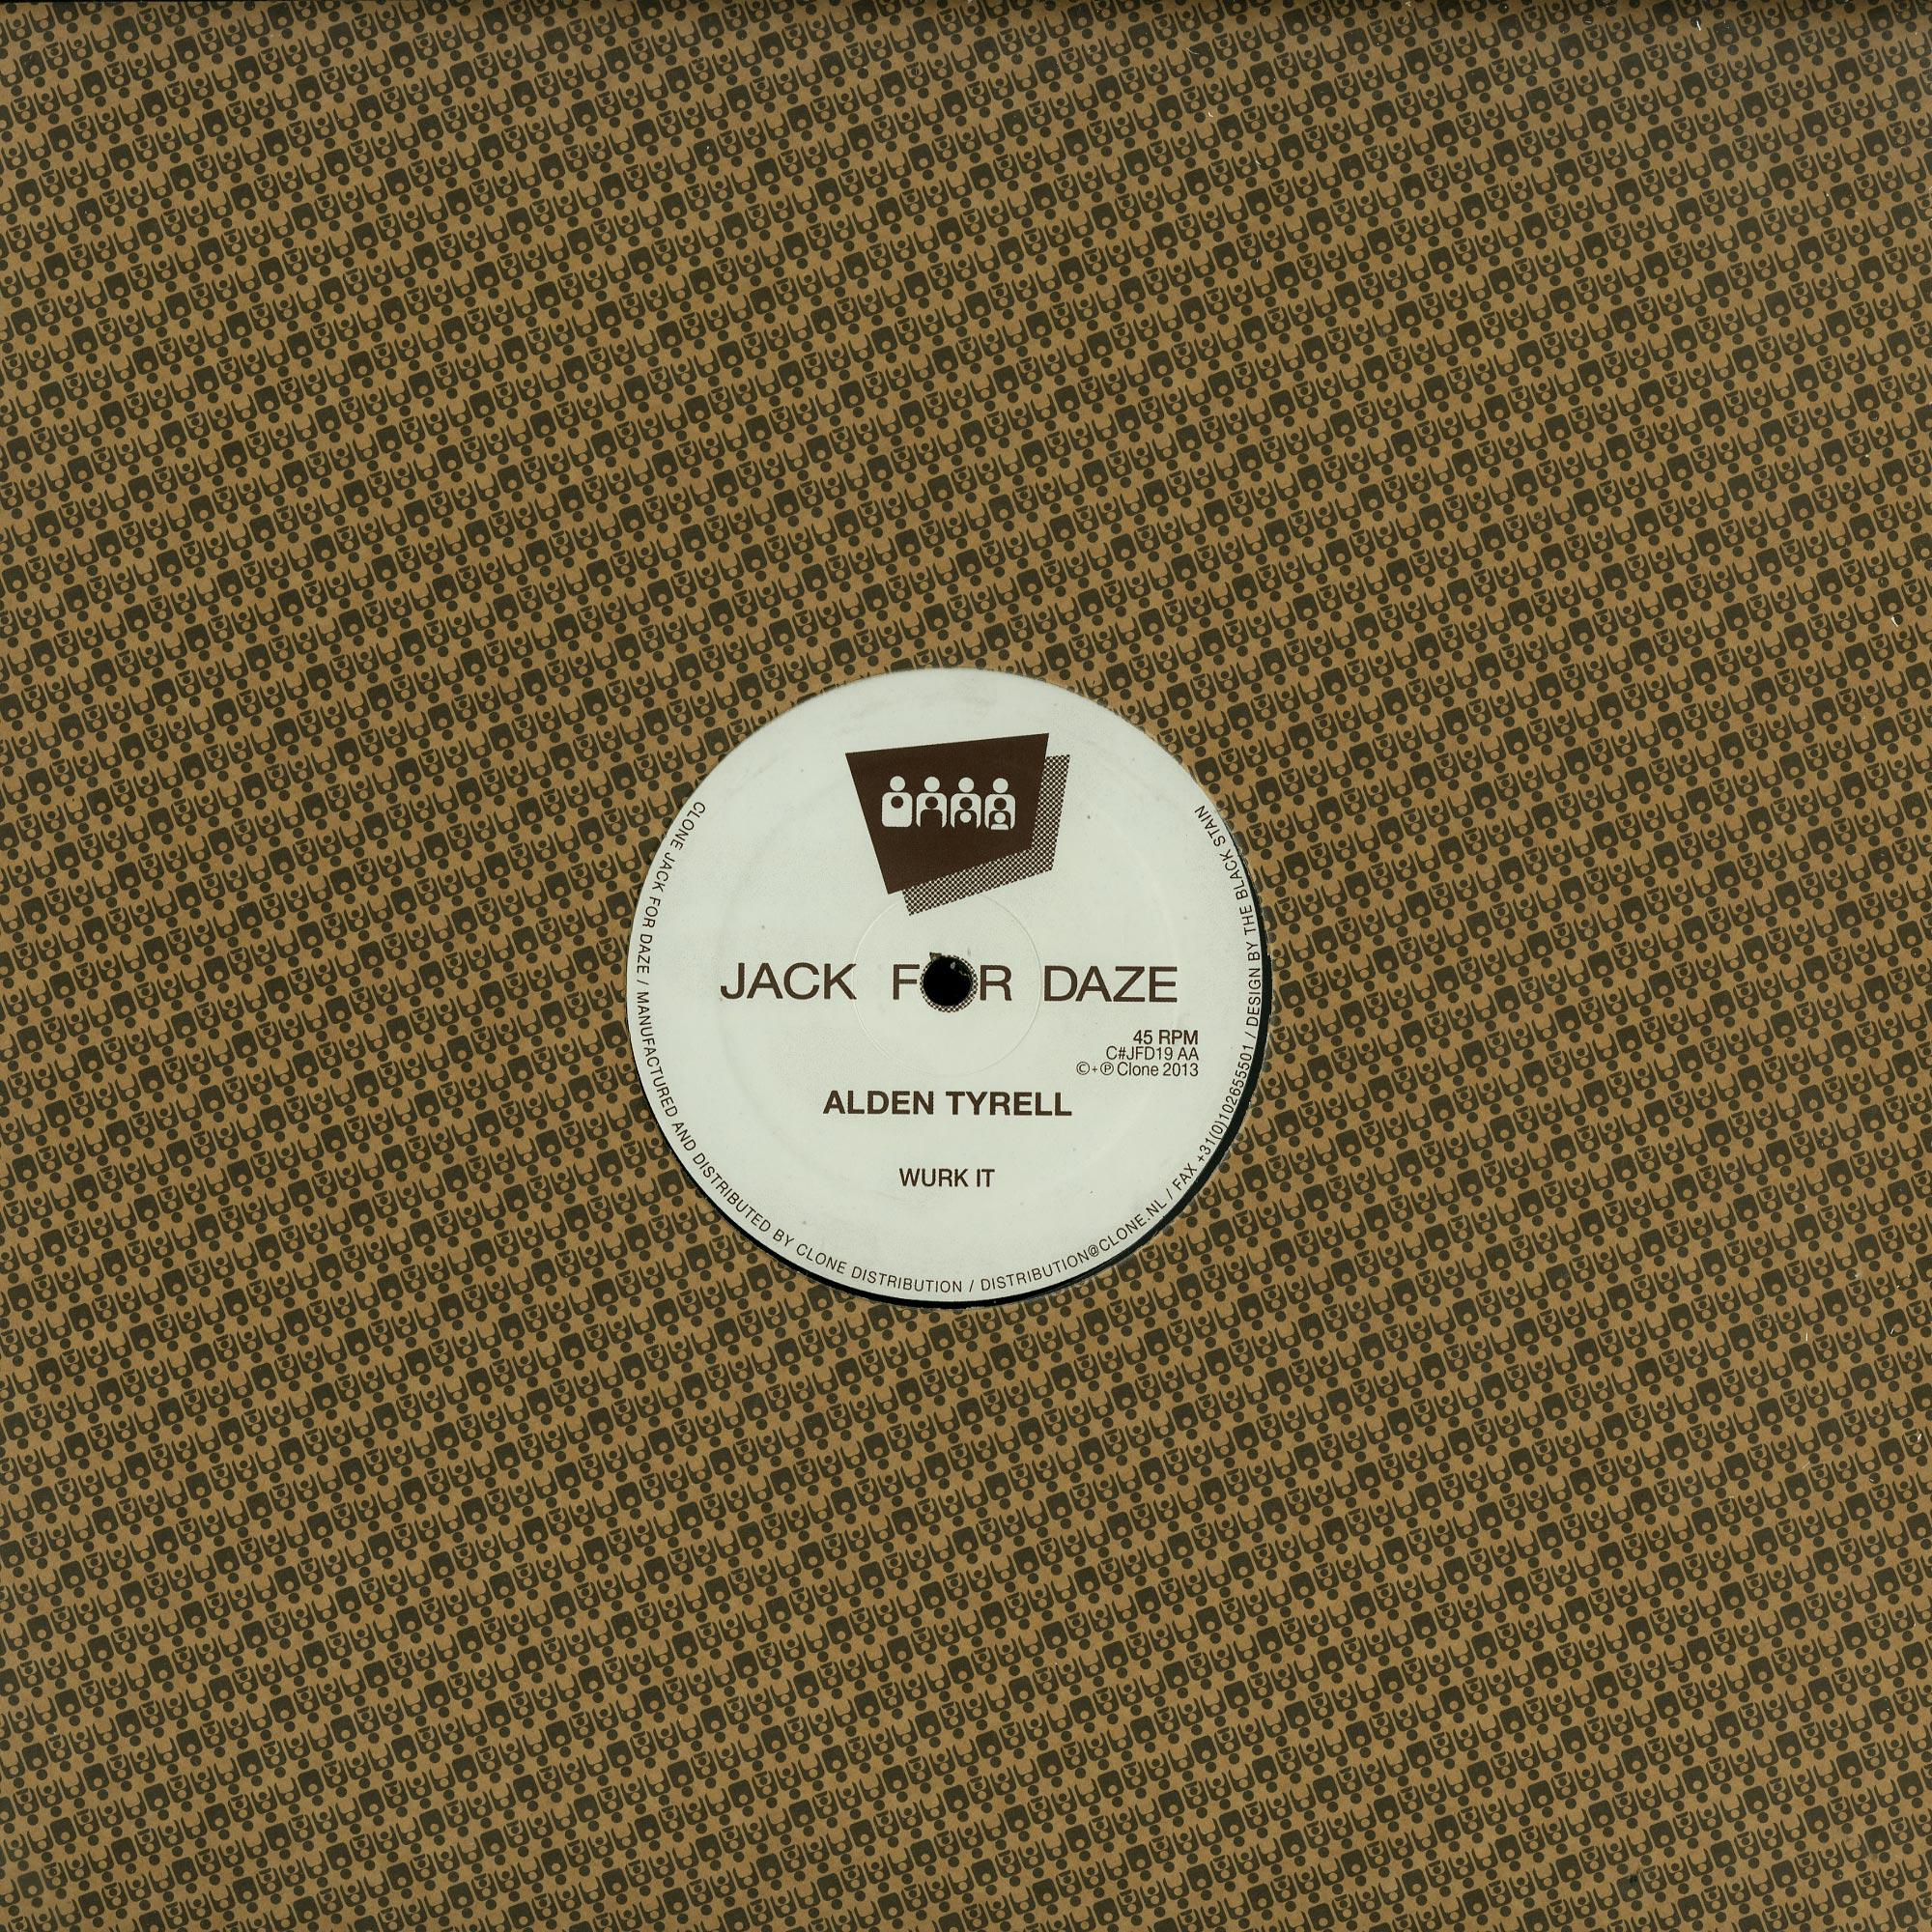 Alden Tyrell - SOMEHOUSE / WURKIT